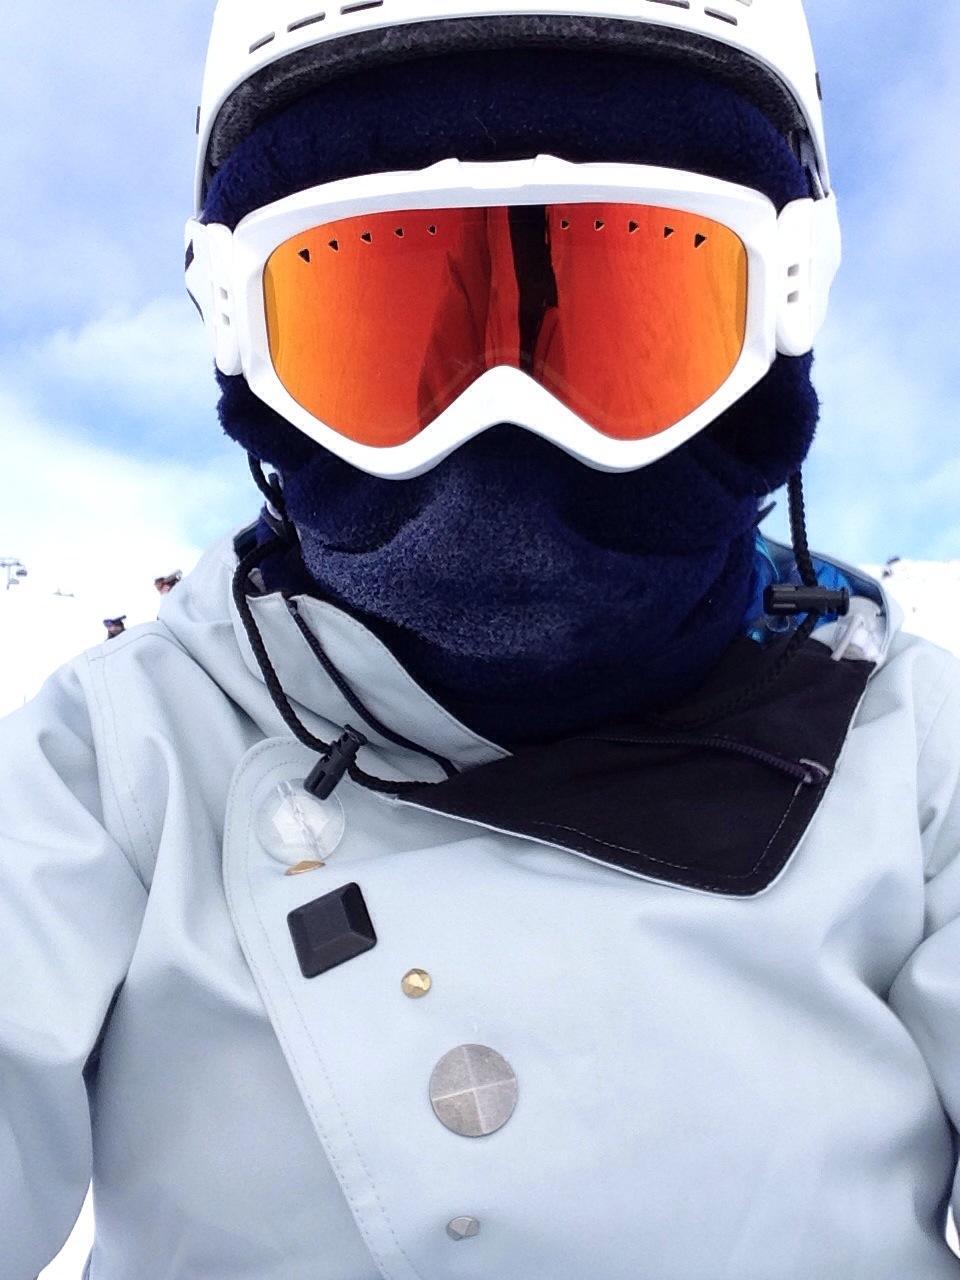 Snowboarding Style